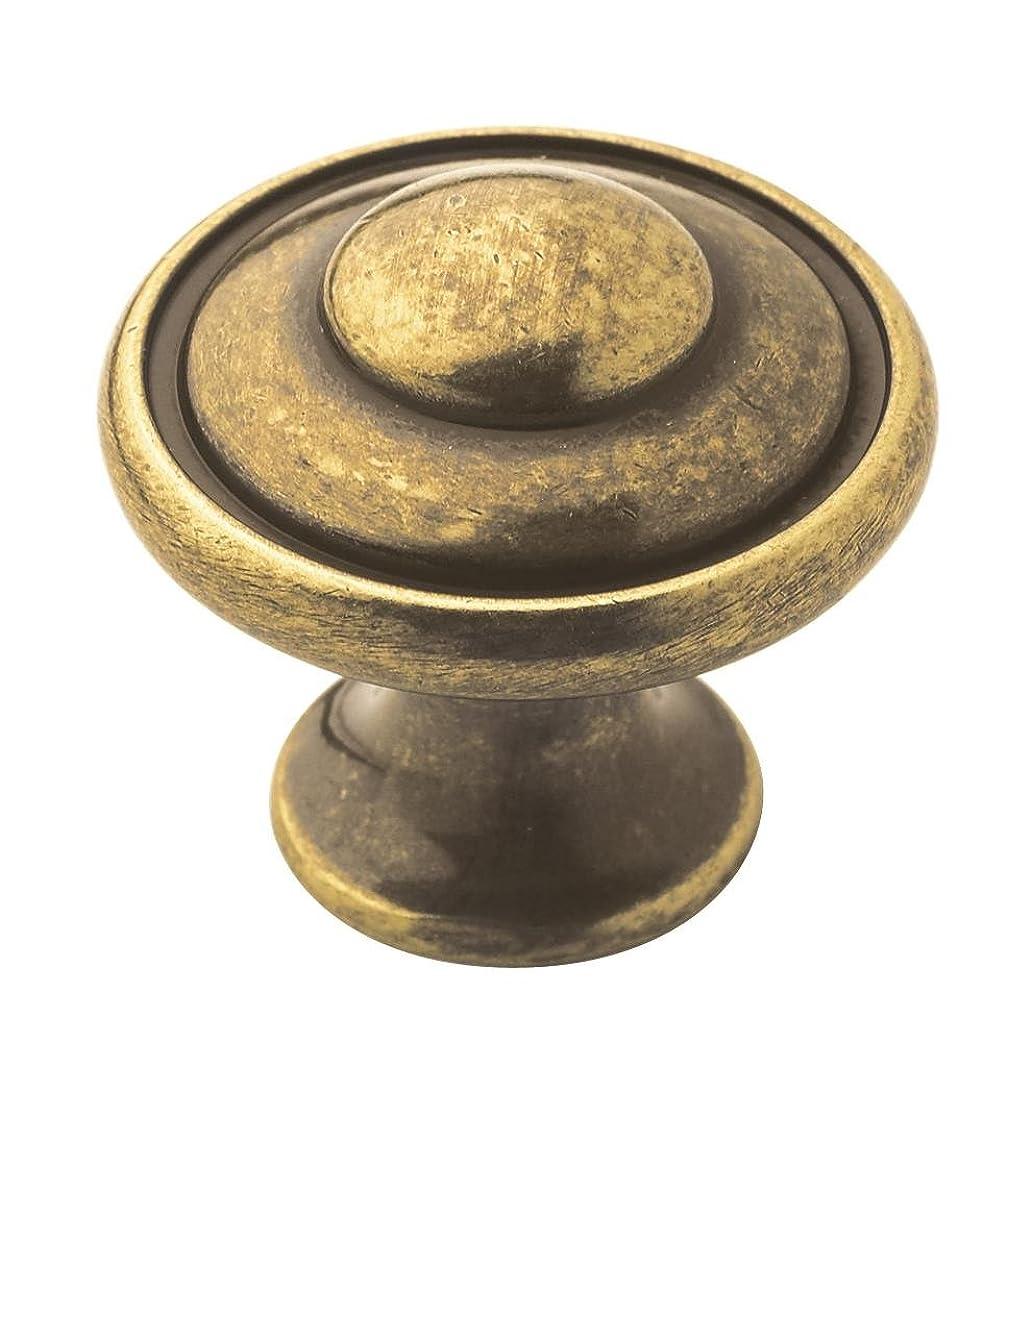 Amerock BP53002BB Allison Value 1-3/16 in (30 mm) Diameter Burnished Brass Cabinet Knob